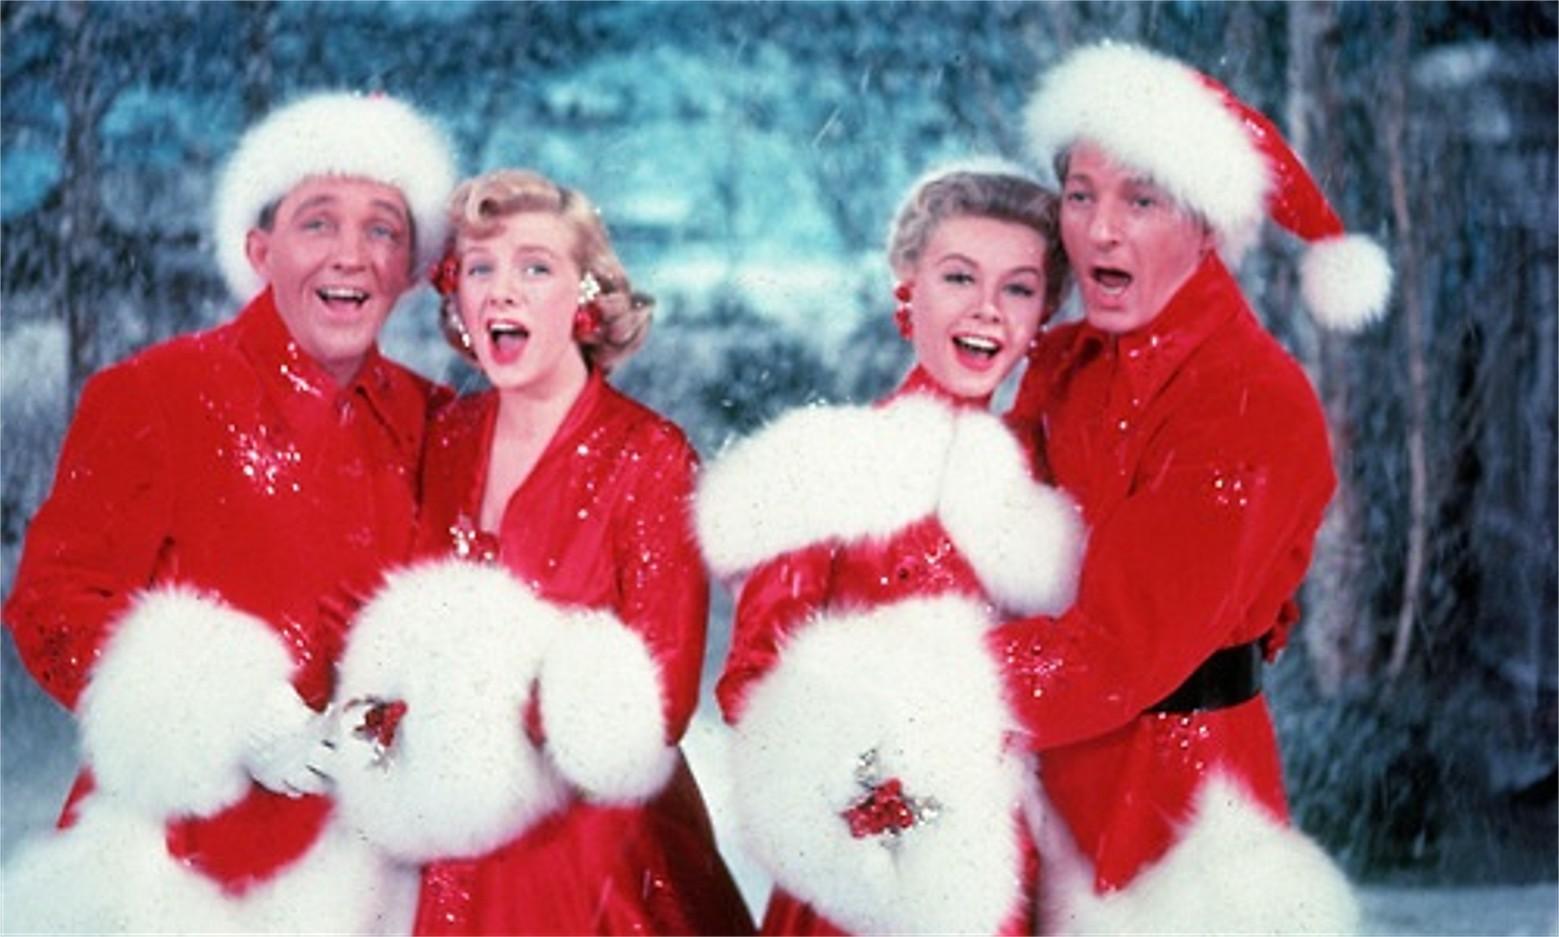 White Christmas - members image